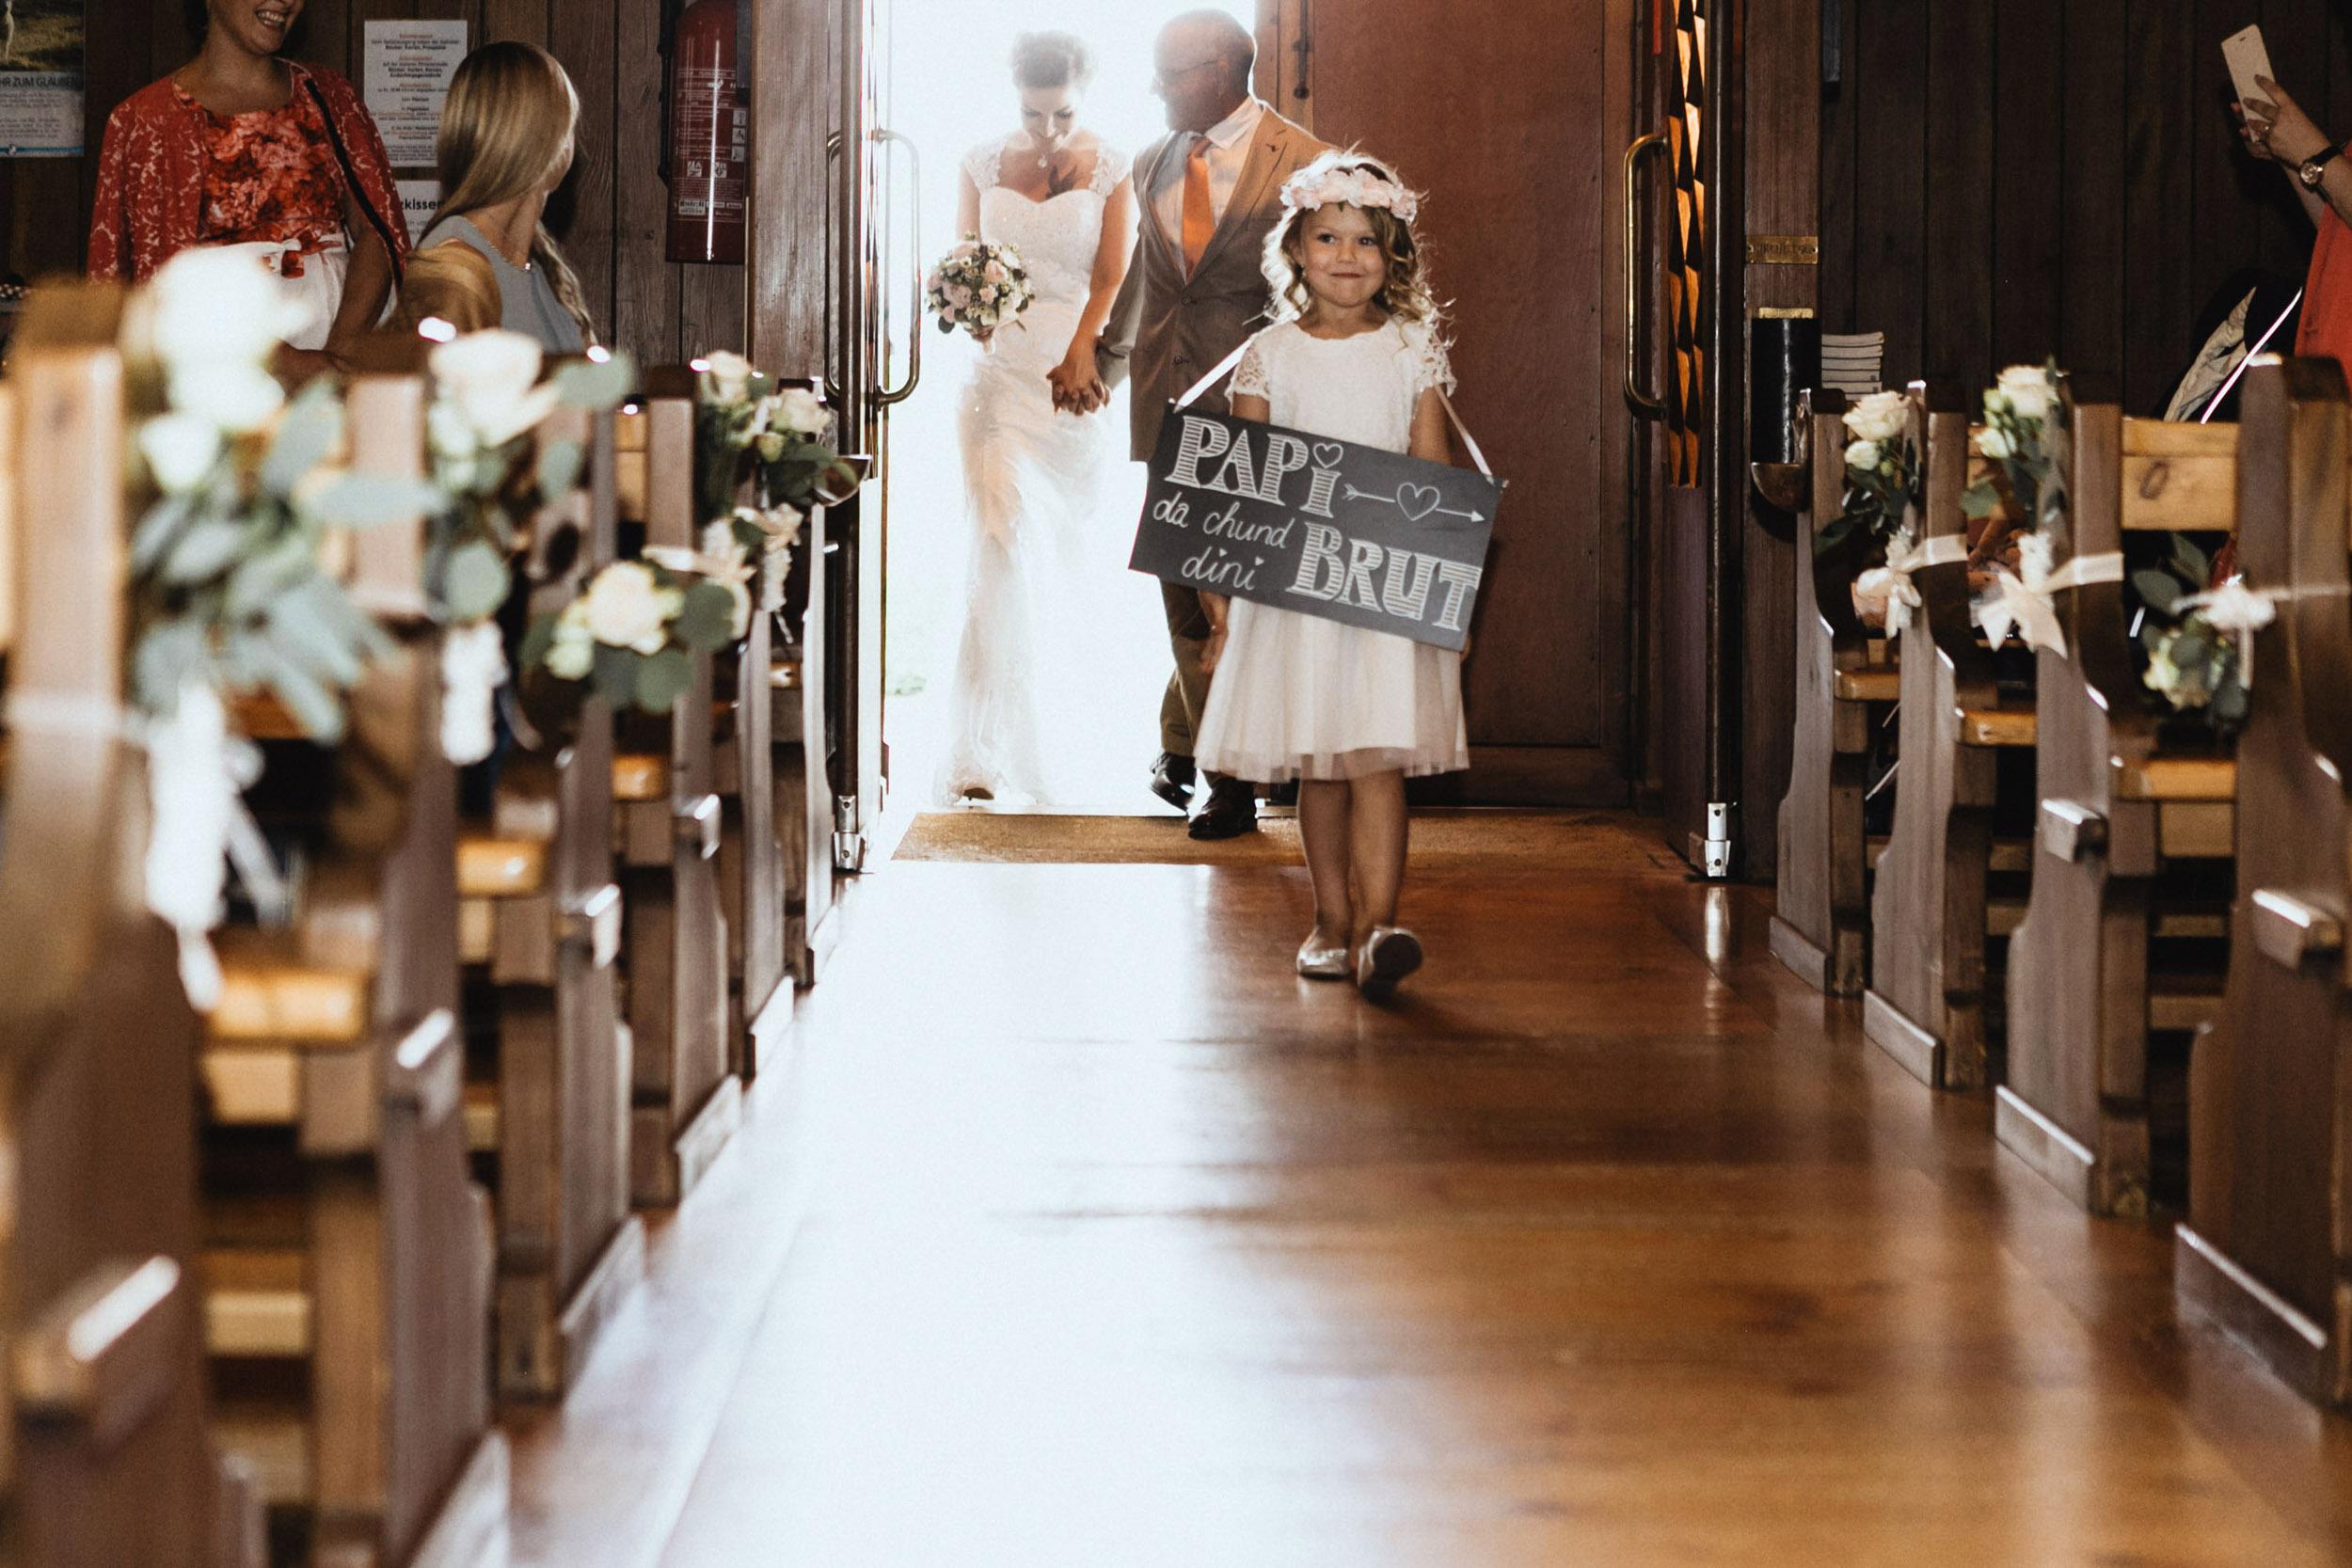 hochzeitsfotografie-schweiz_wedding-photographer-switzerland-europe_Bendik-Photography-008